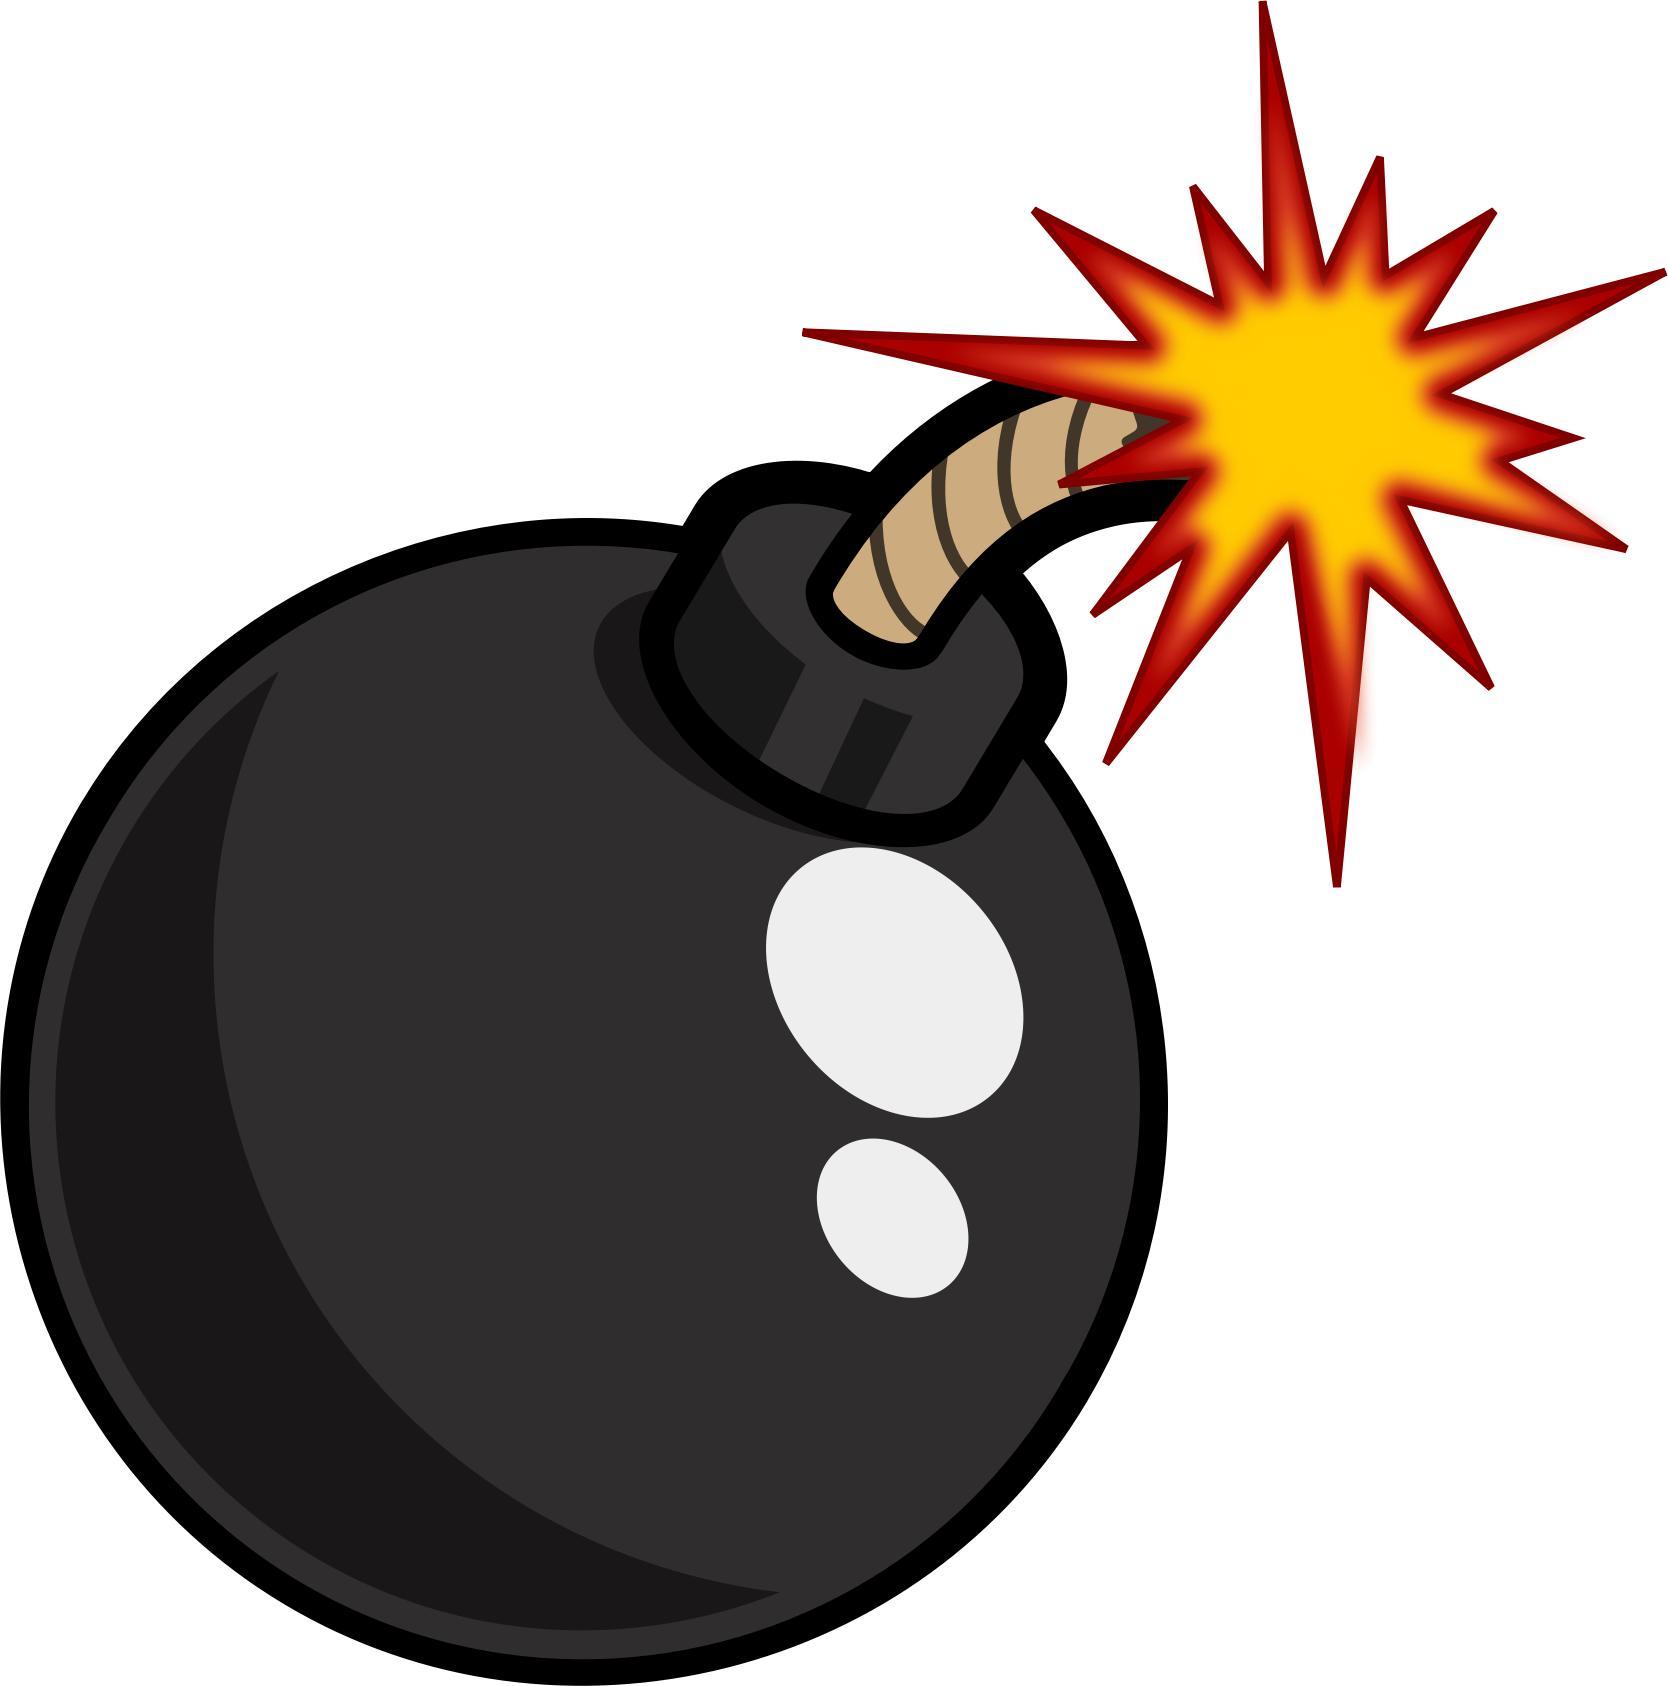 Black Cartoon Bomb Icons PNG